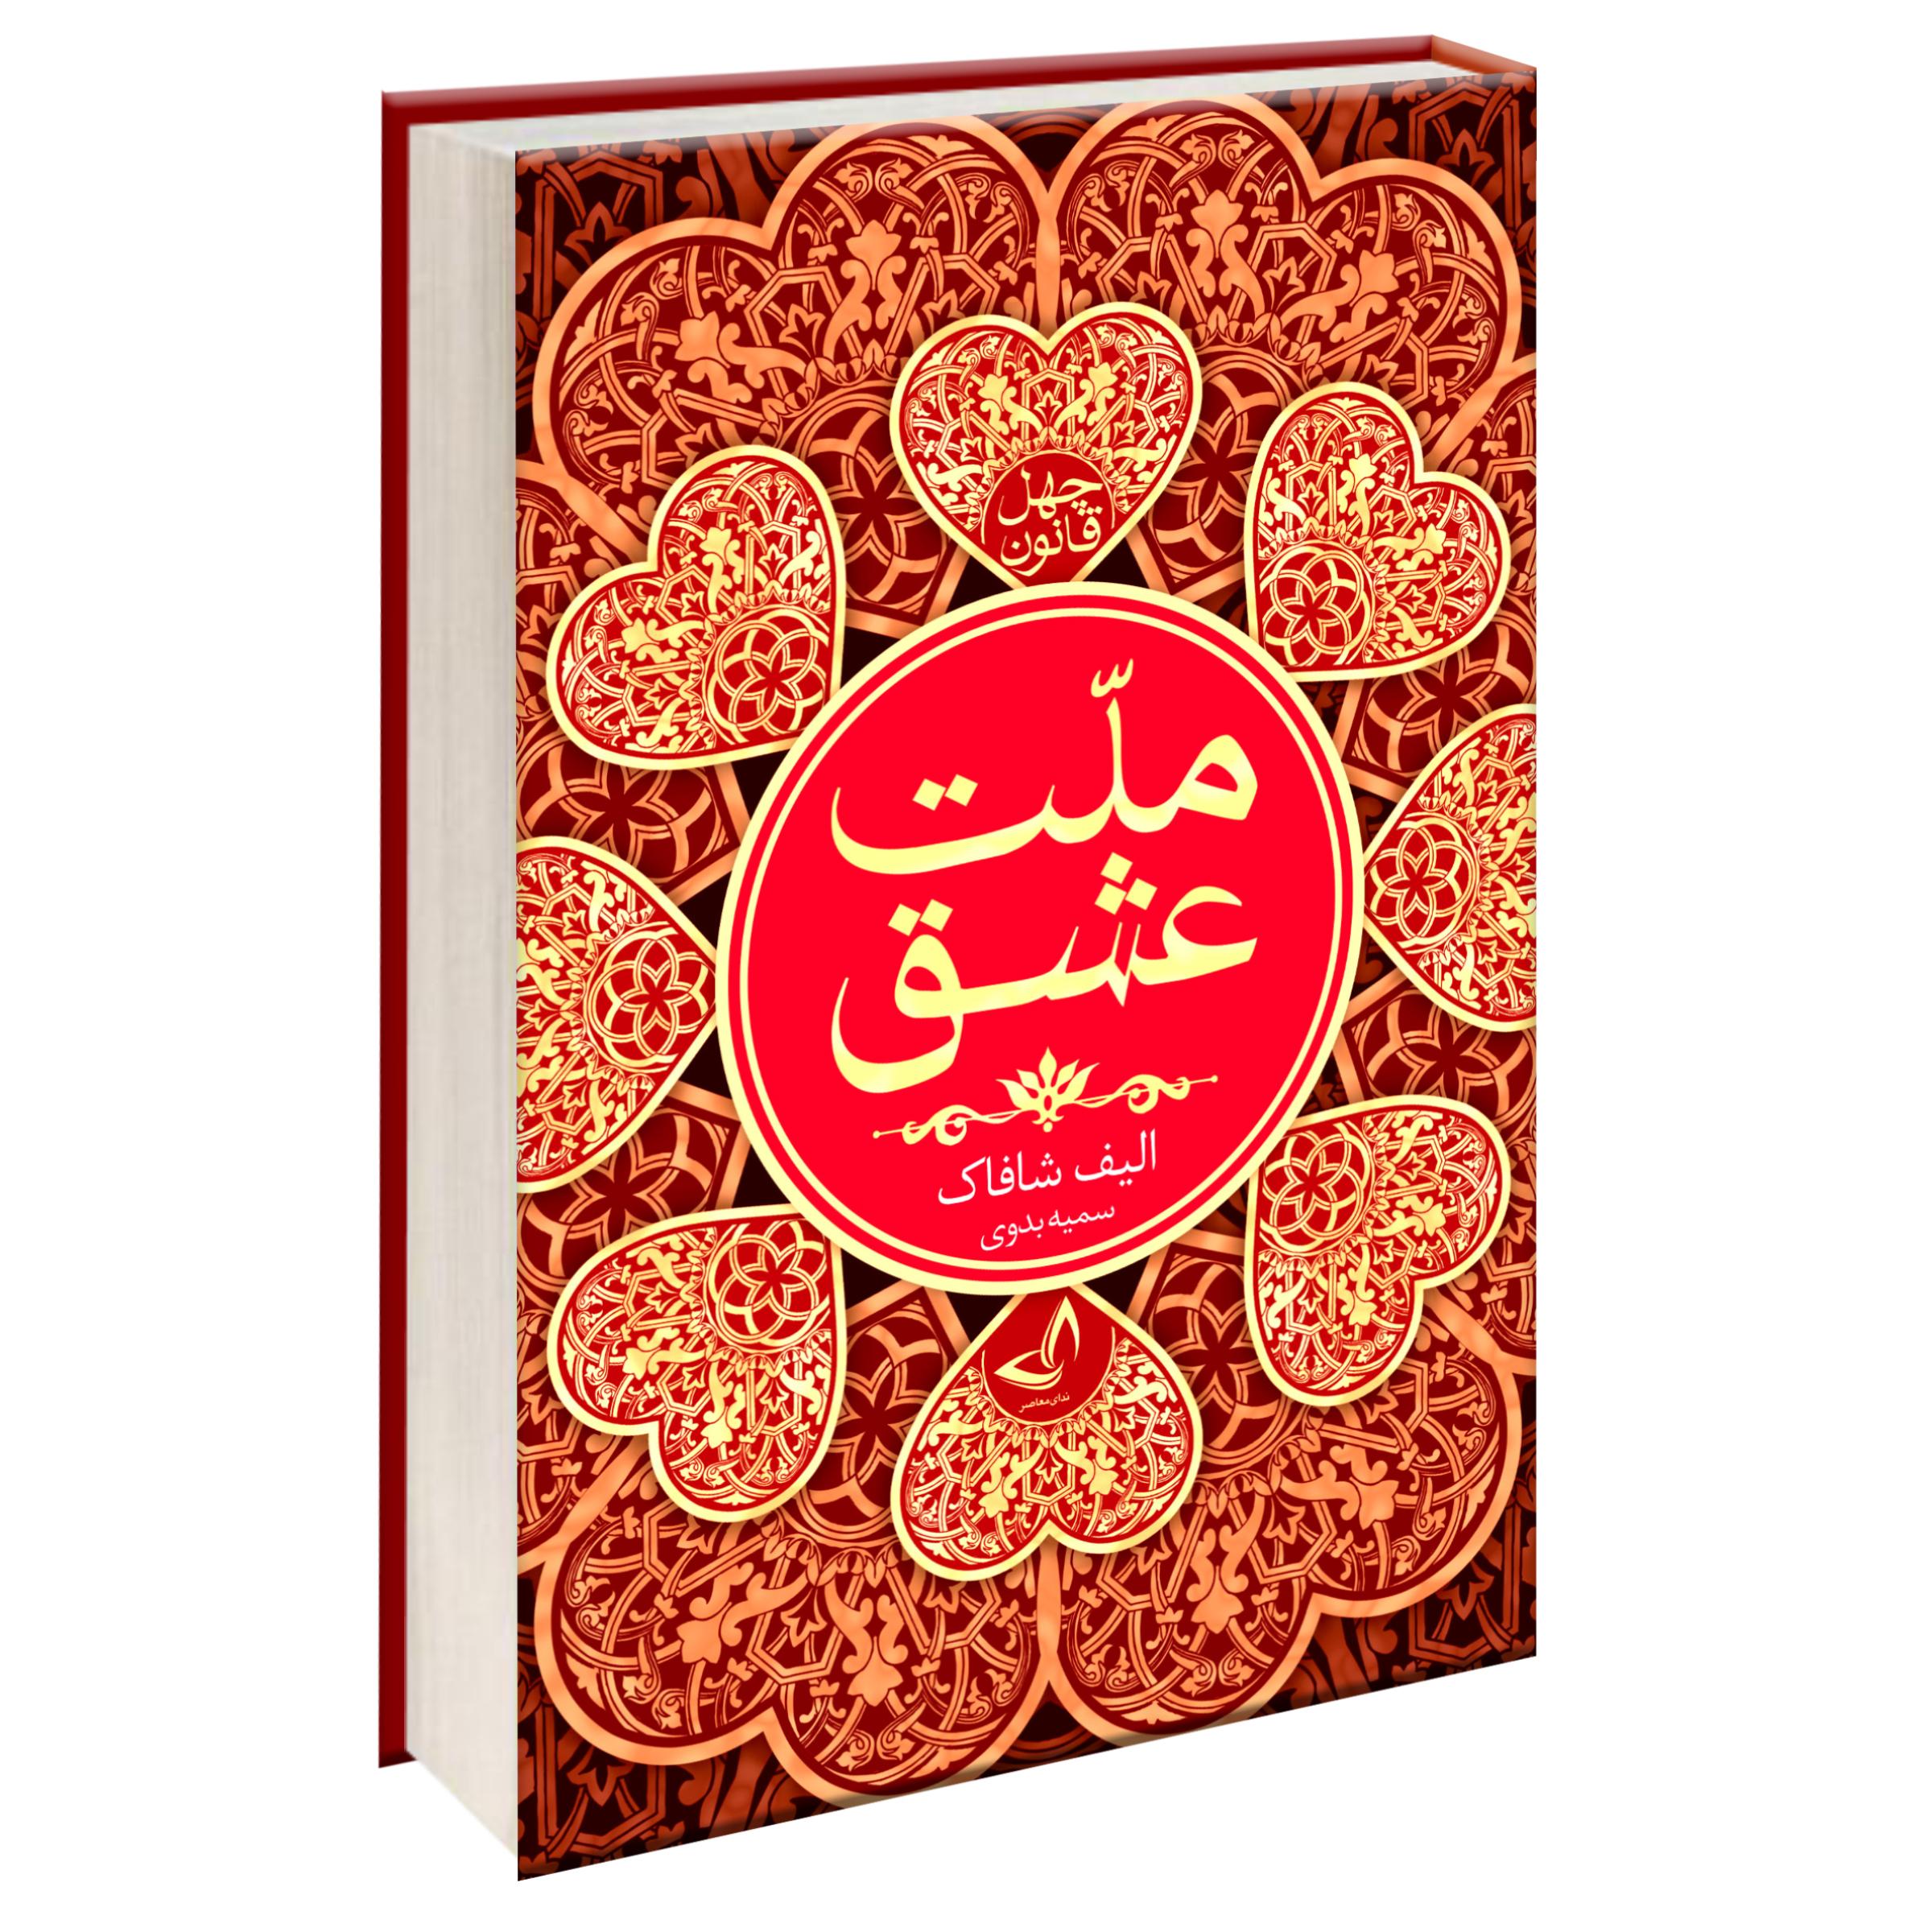 کتاب ملت عشق اثر الیف شافاک انتشارات ندای معاصر